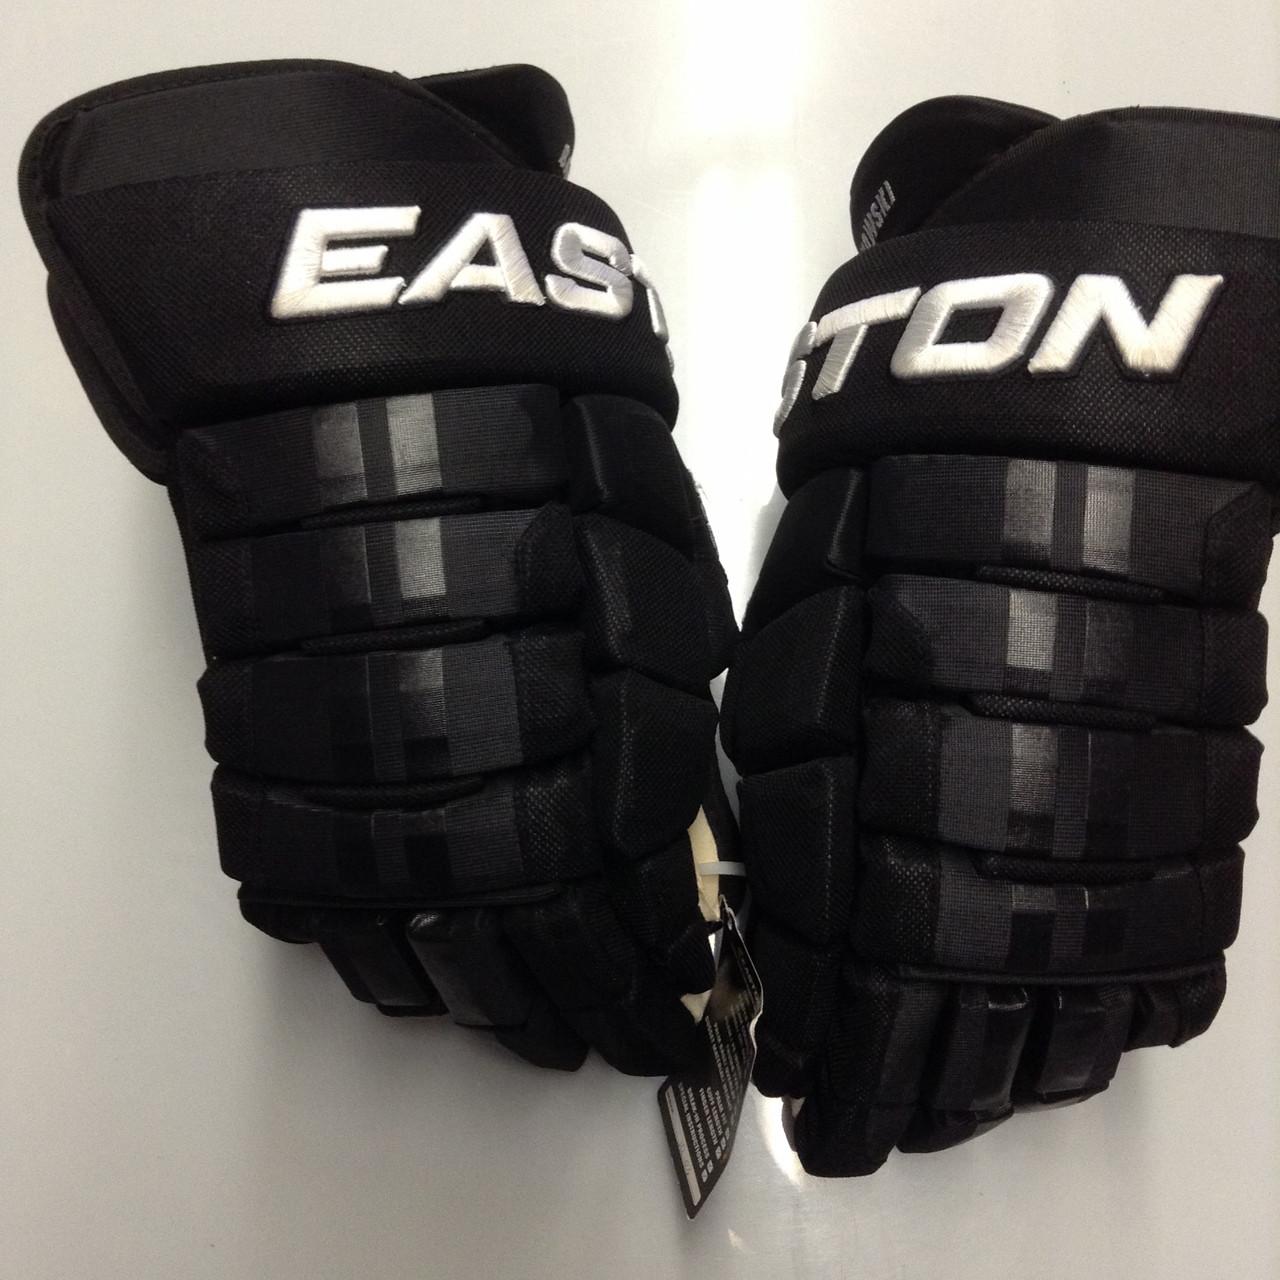 detailed look 9cf74 32387 Easton Pro Custom Hockey Gloves Pro Stock 15